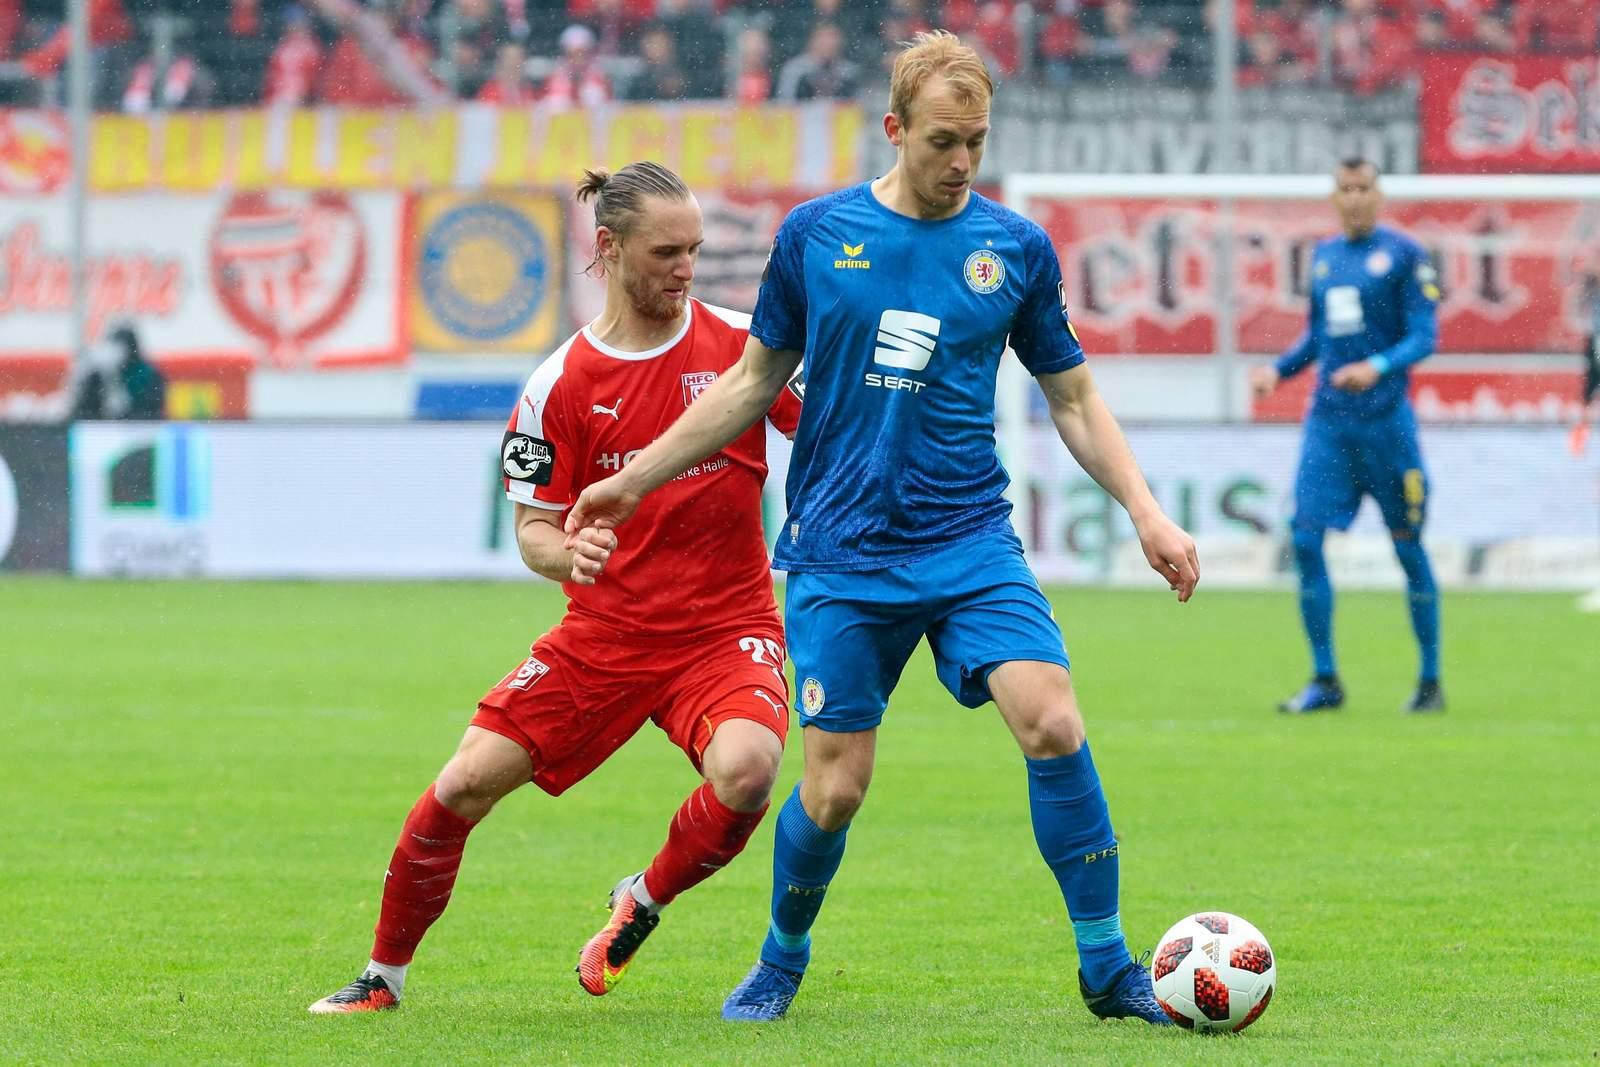 Julius Düker am Ball für Braunschweig